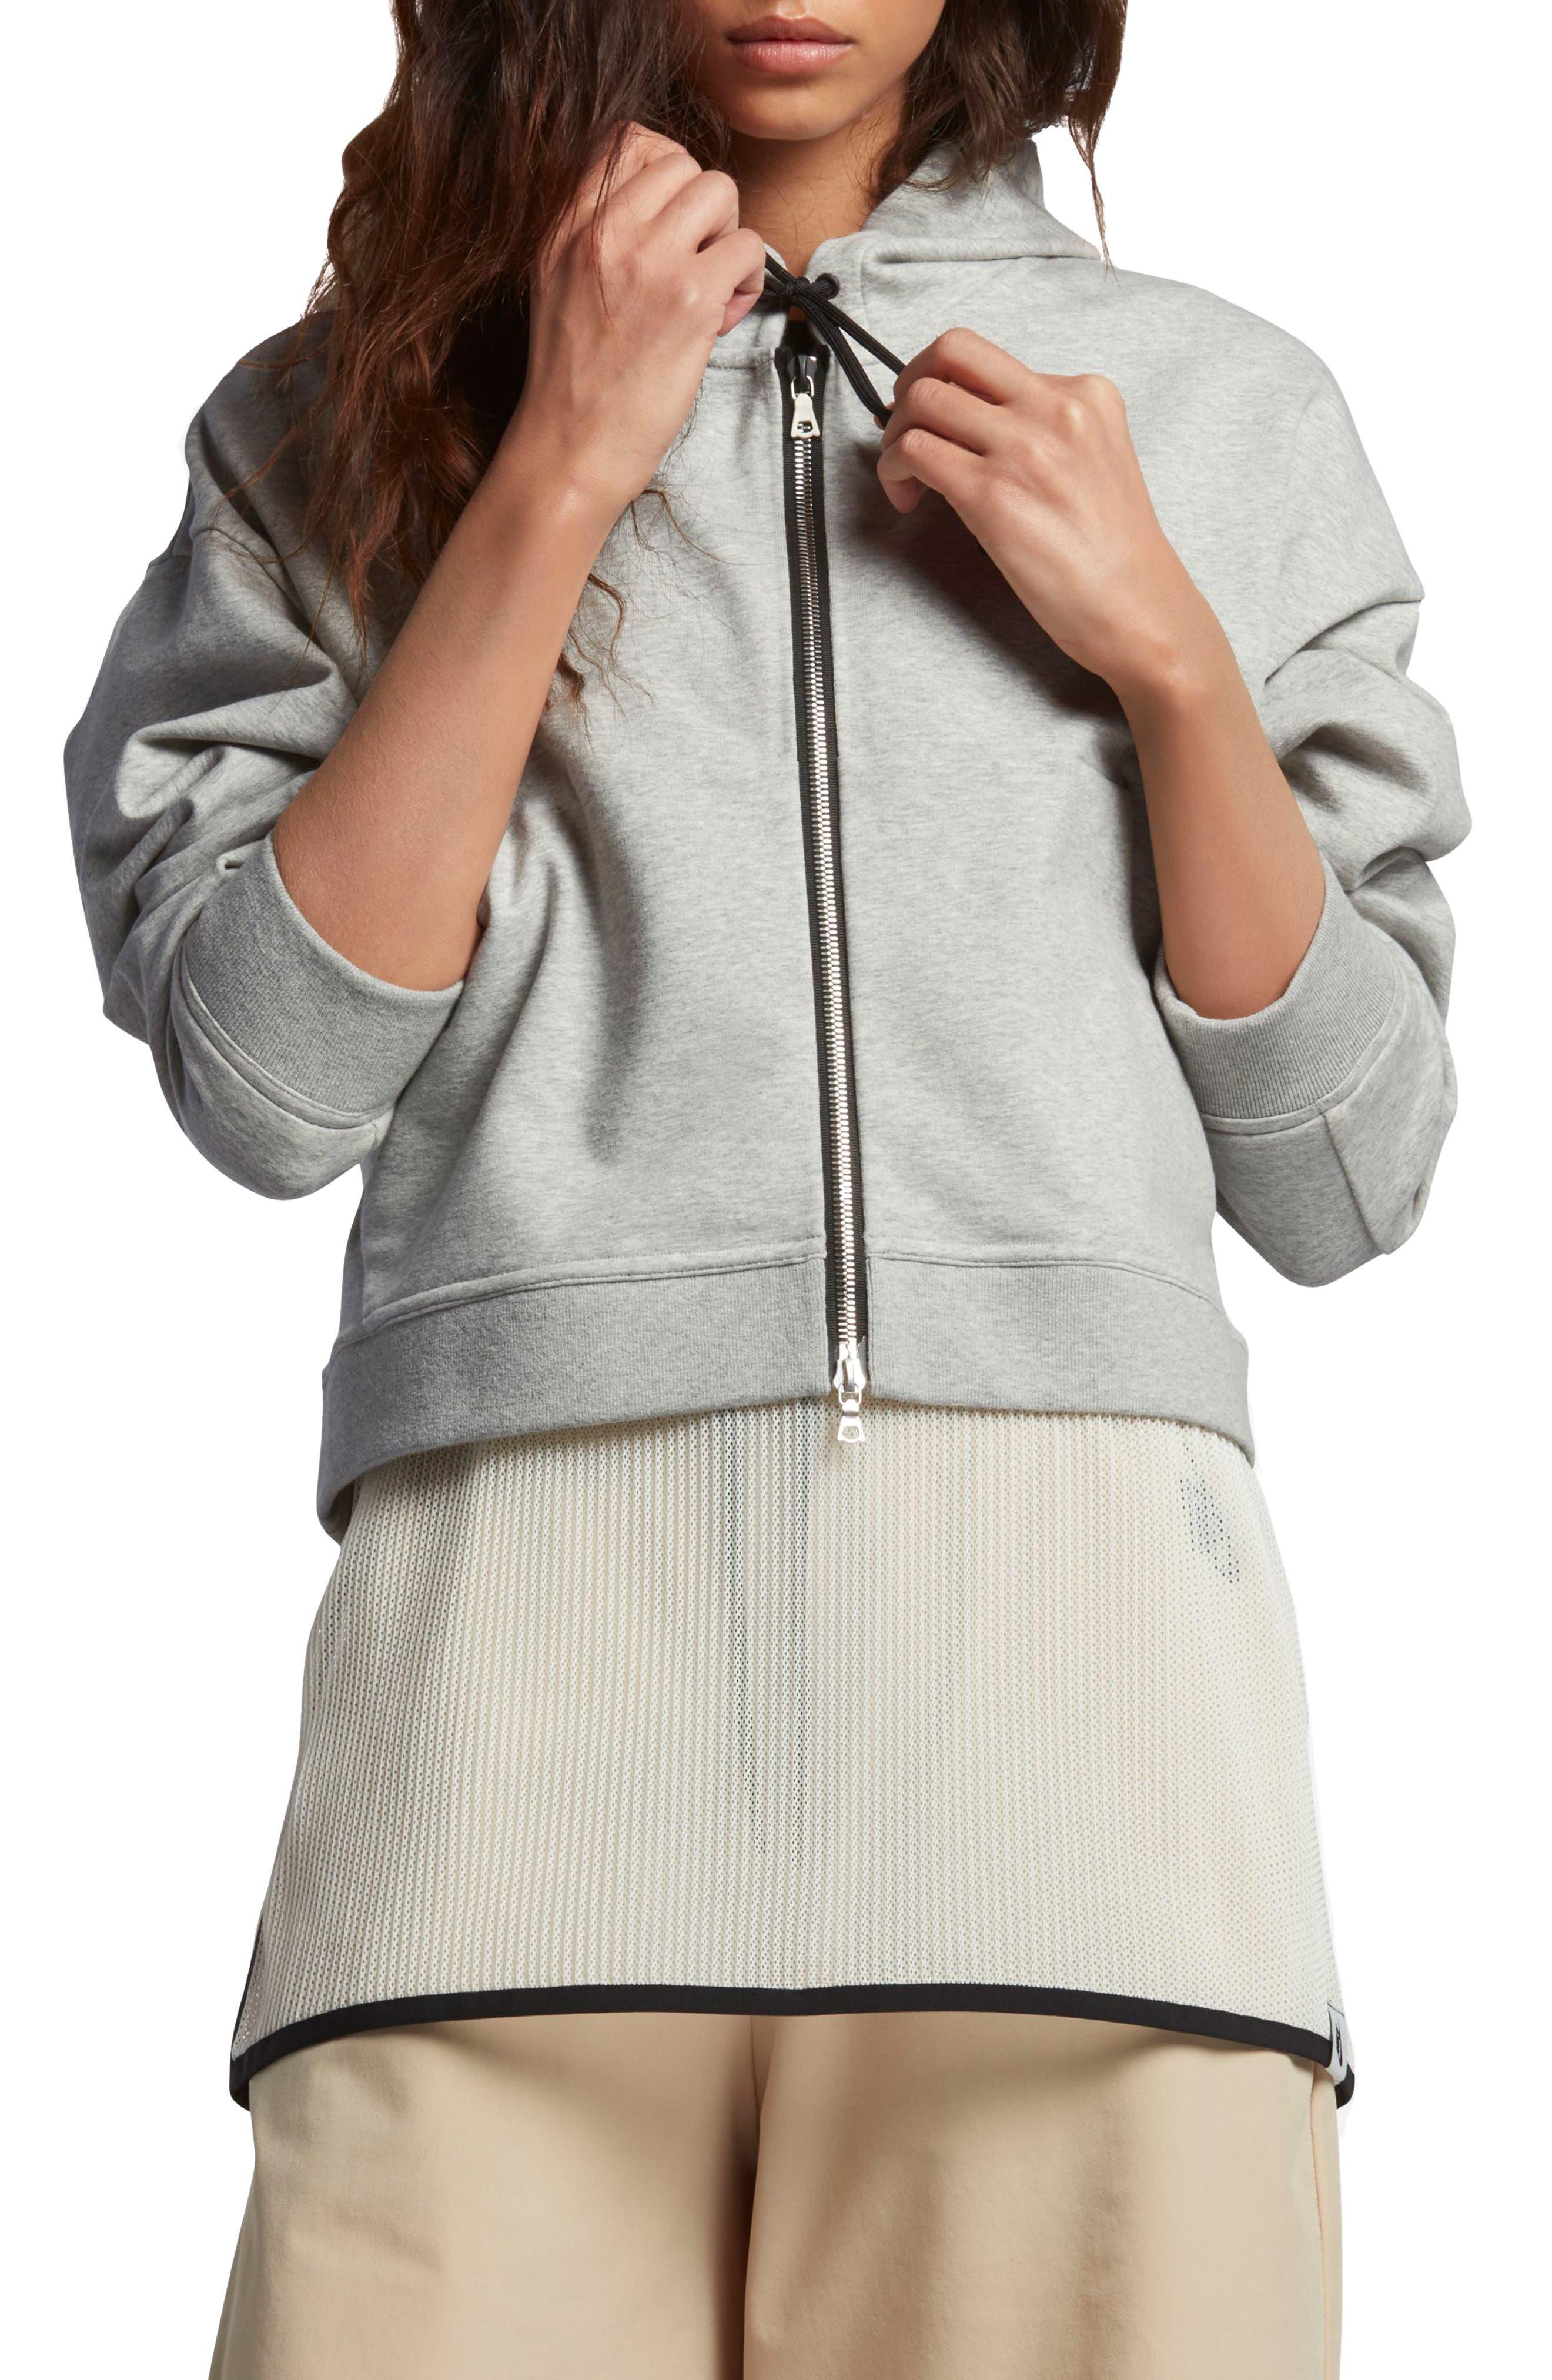 Lab Essentials Crop Hoodie,                         Main,                         color, Grey Heather/ Pale Grey/ Black